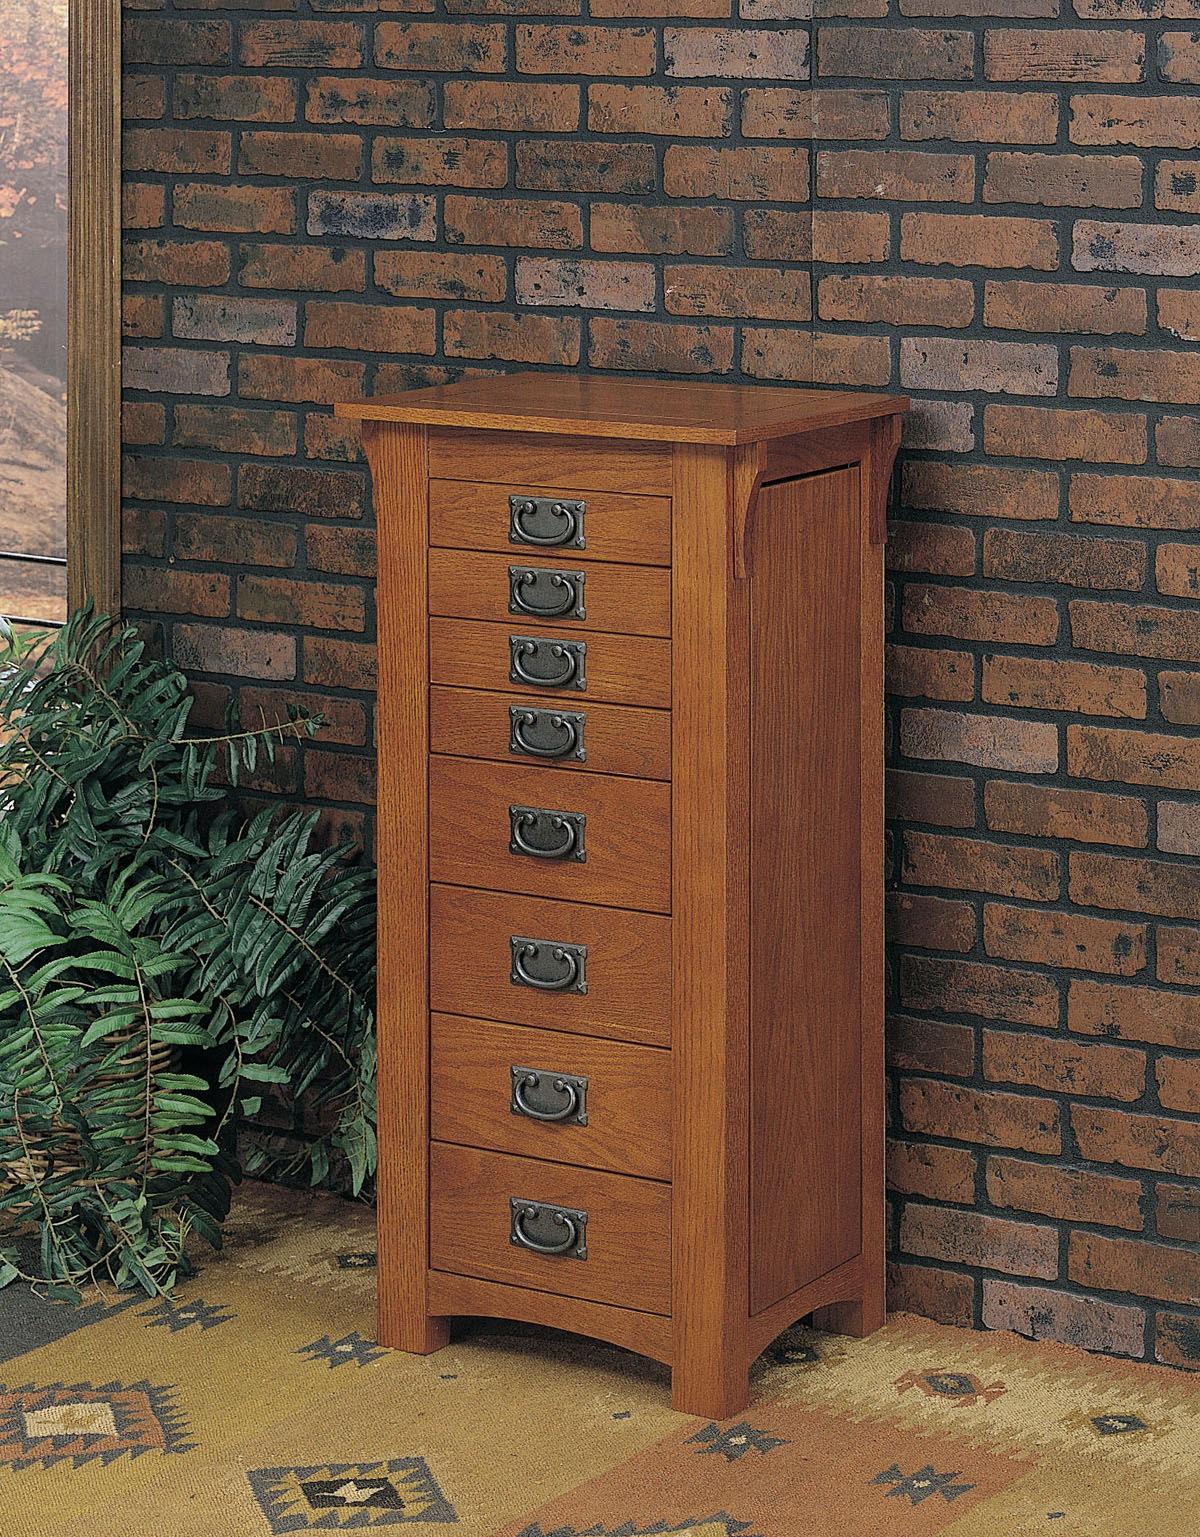 Powell Furniture Mission Oak Jewelry Armoire 255